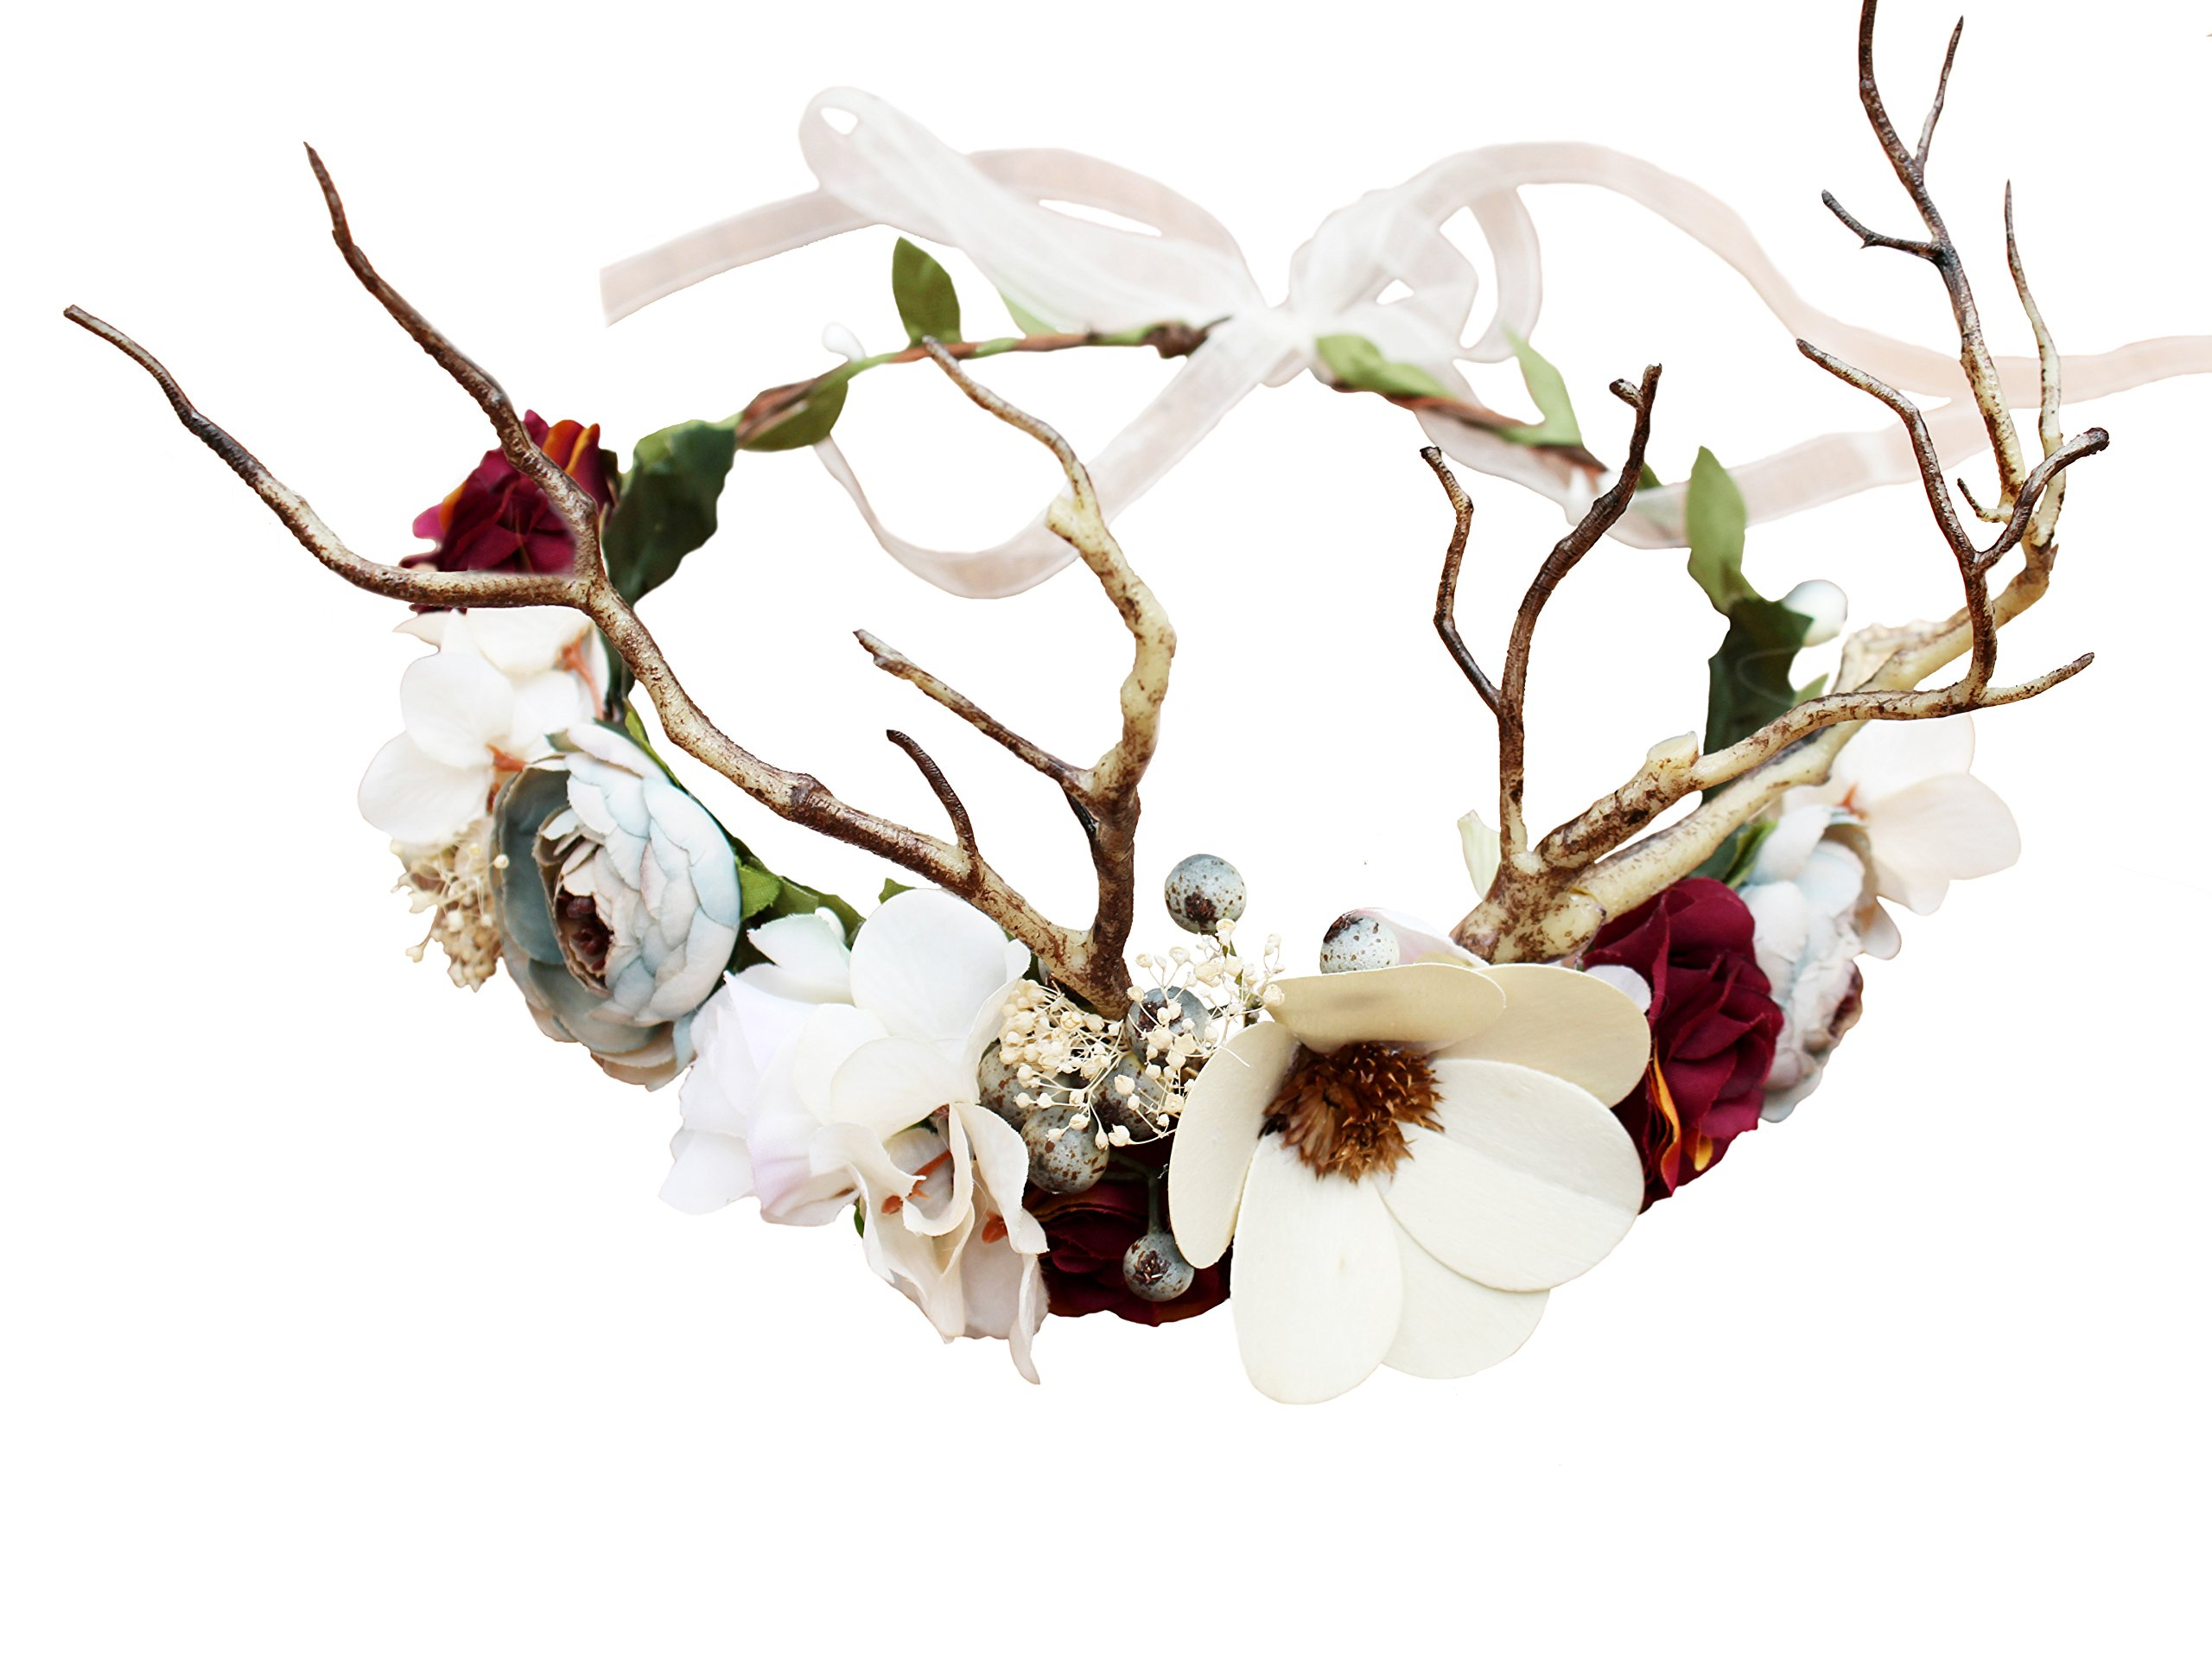 Vivivalue Deer Horn Boho Handmade Flower Wreath Headband Crown Halo Floral Hair Garland Headpiece with Ribbon Festival Wedding